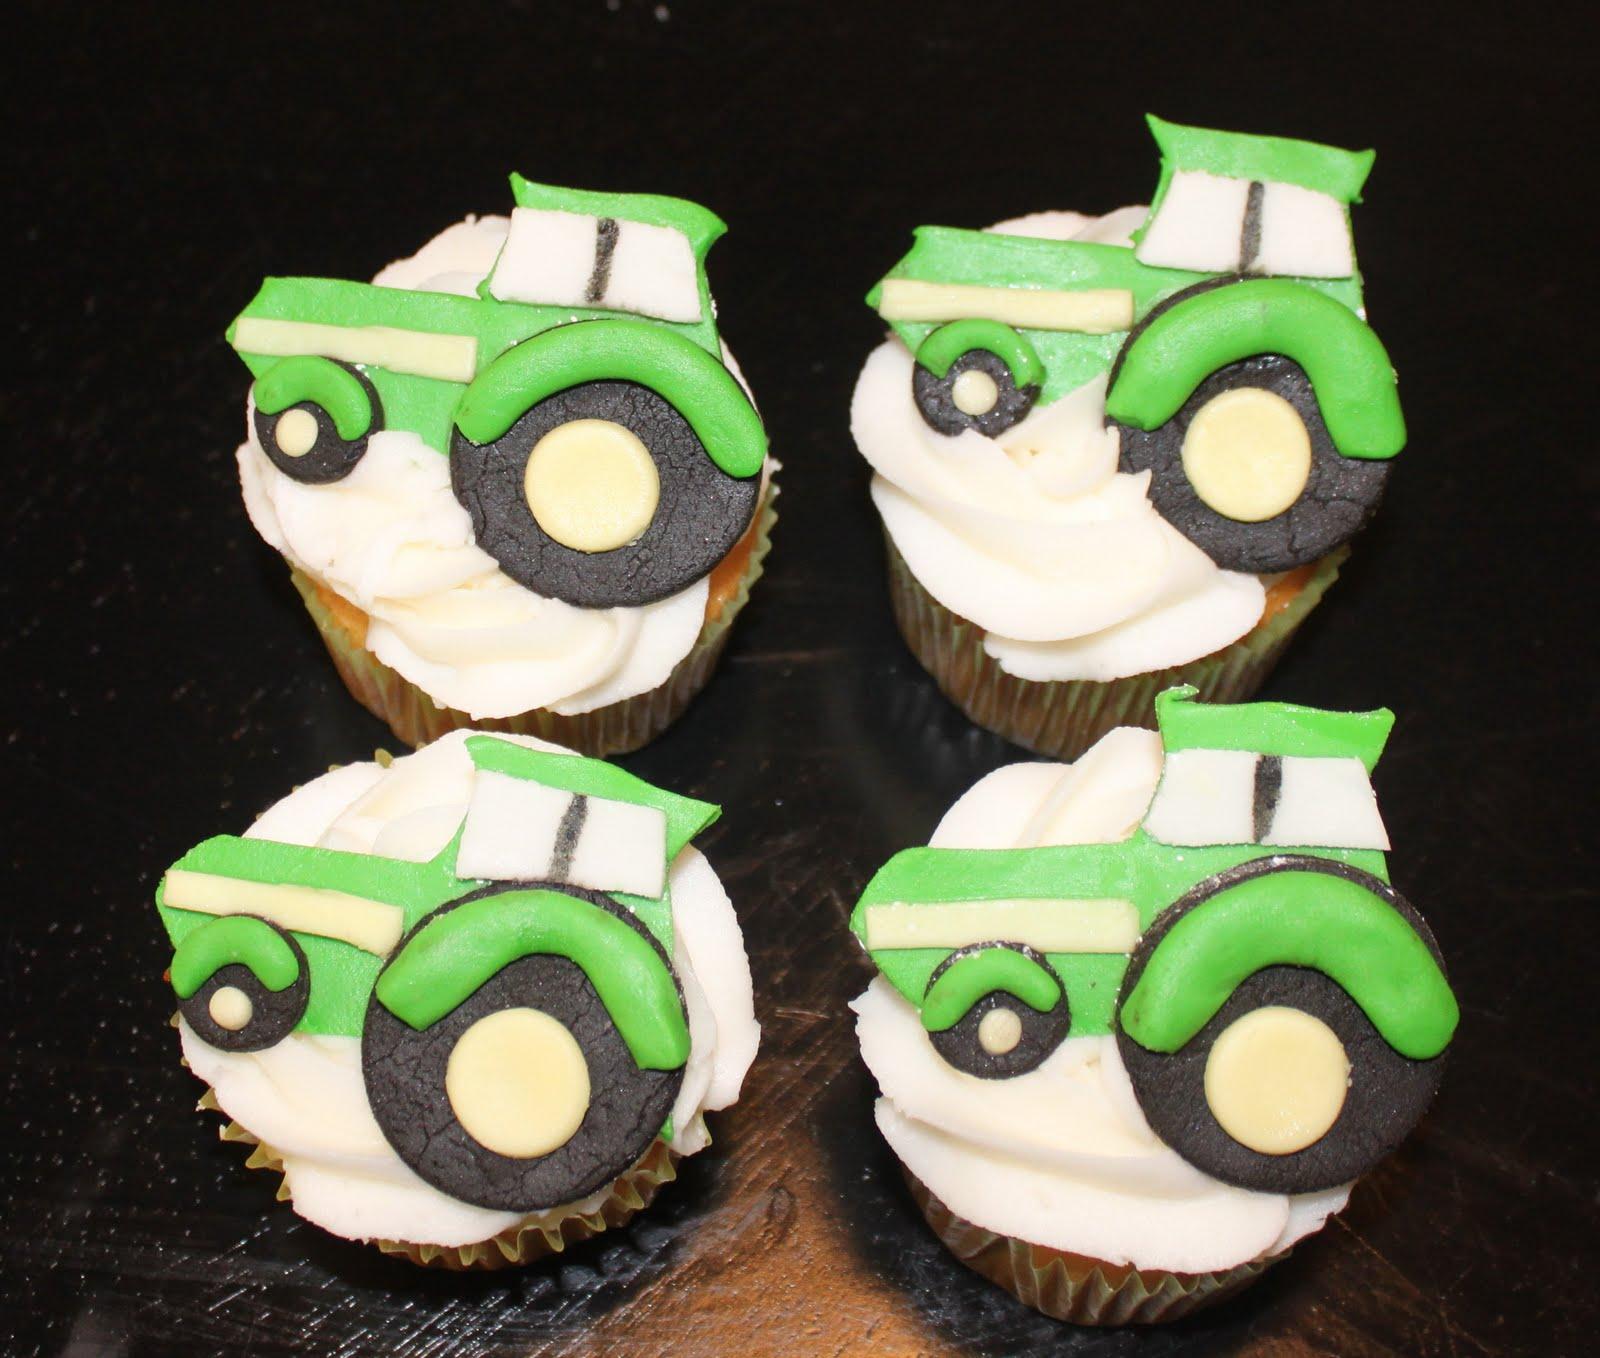 http://3.bp.blogspot.com/_3jXzkj44qbE/TJ4ItHUSg9I/AAAAAAAAAkM/Mpuv656eusk/s1600/John%2BDeere%2BCupcakes.jpg